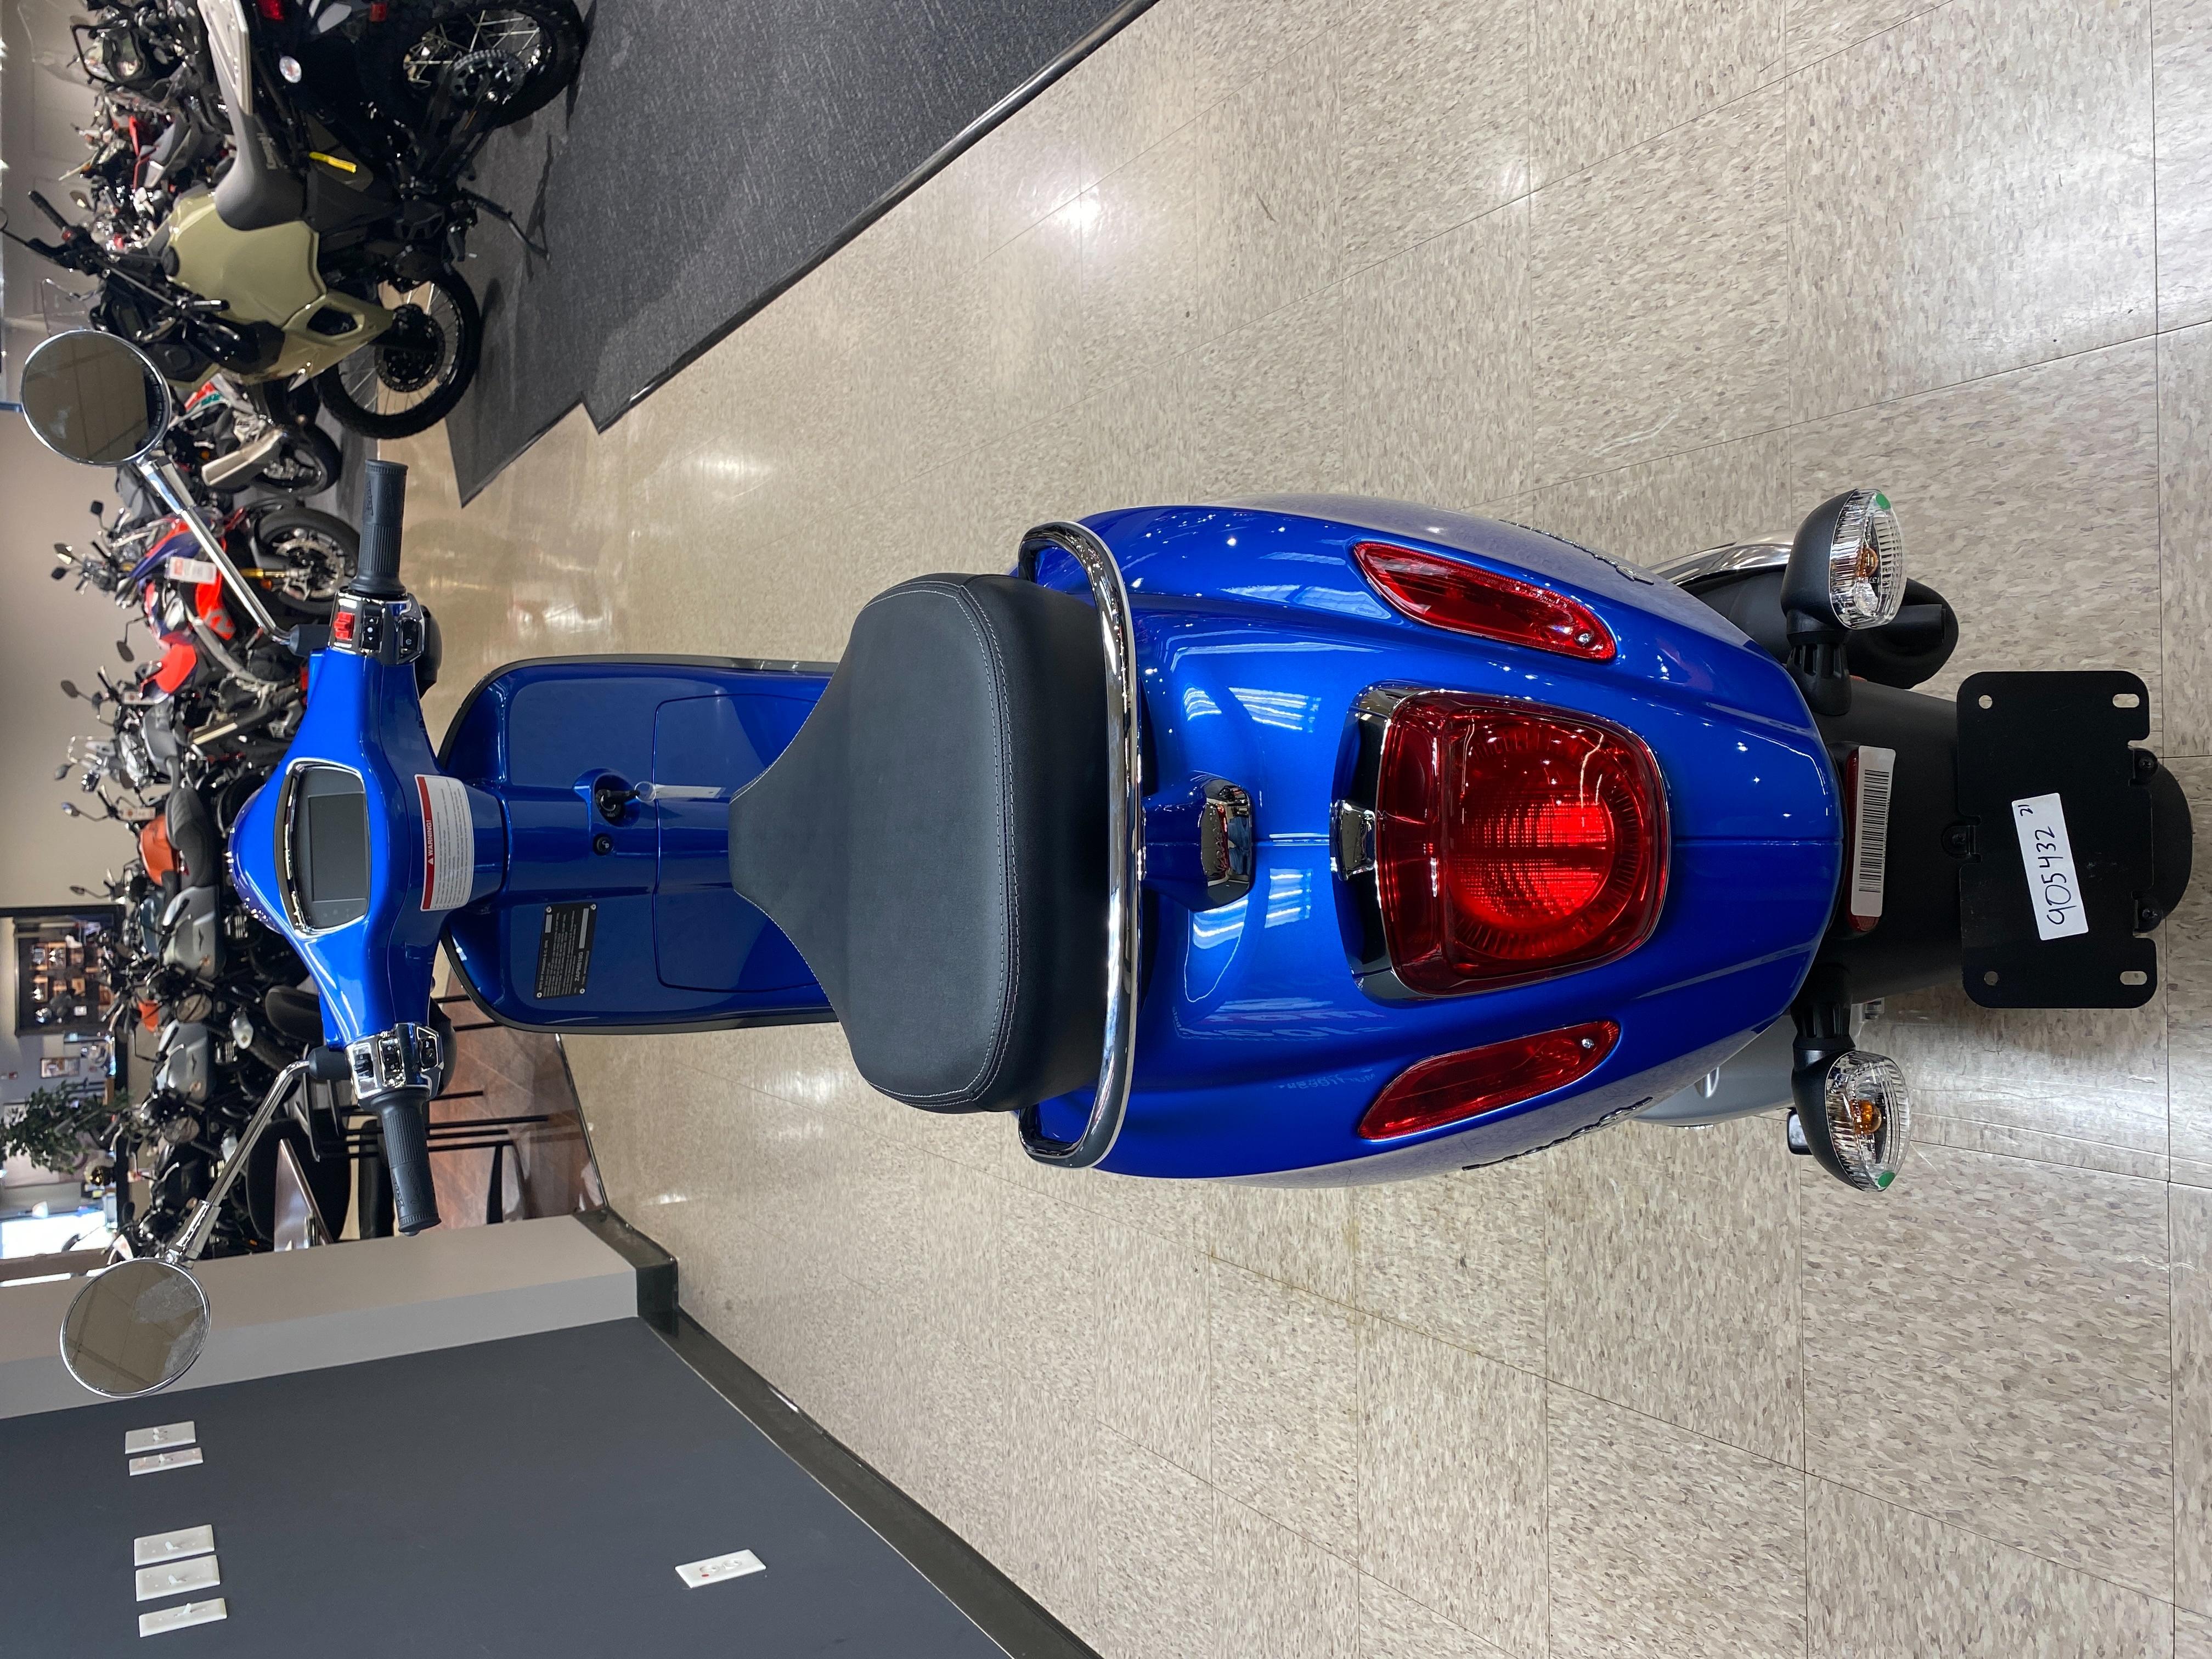 2022 Vespa PRIMAVERA S 150 ABS PRIMAVERA S 150 ABS at Sloans Motorcycle ATV, Murfreesboro, TN, 37129